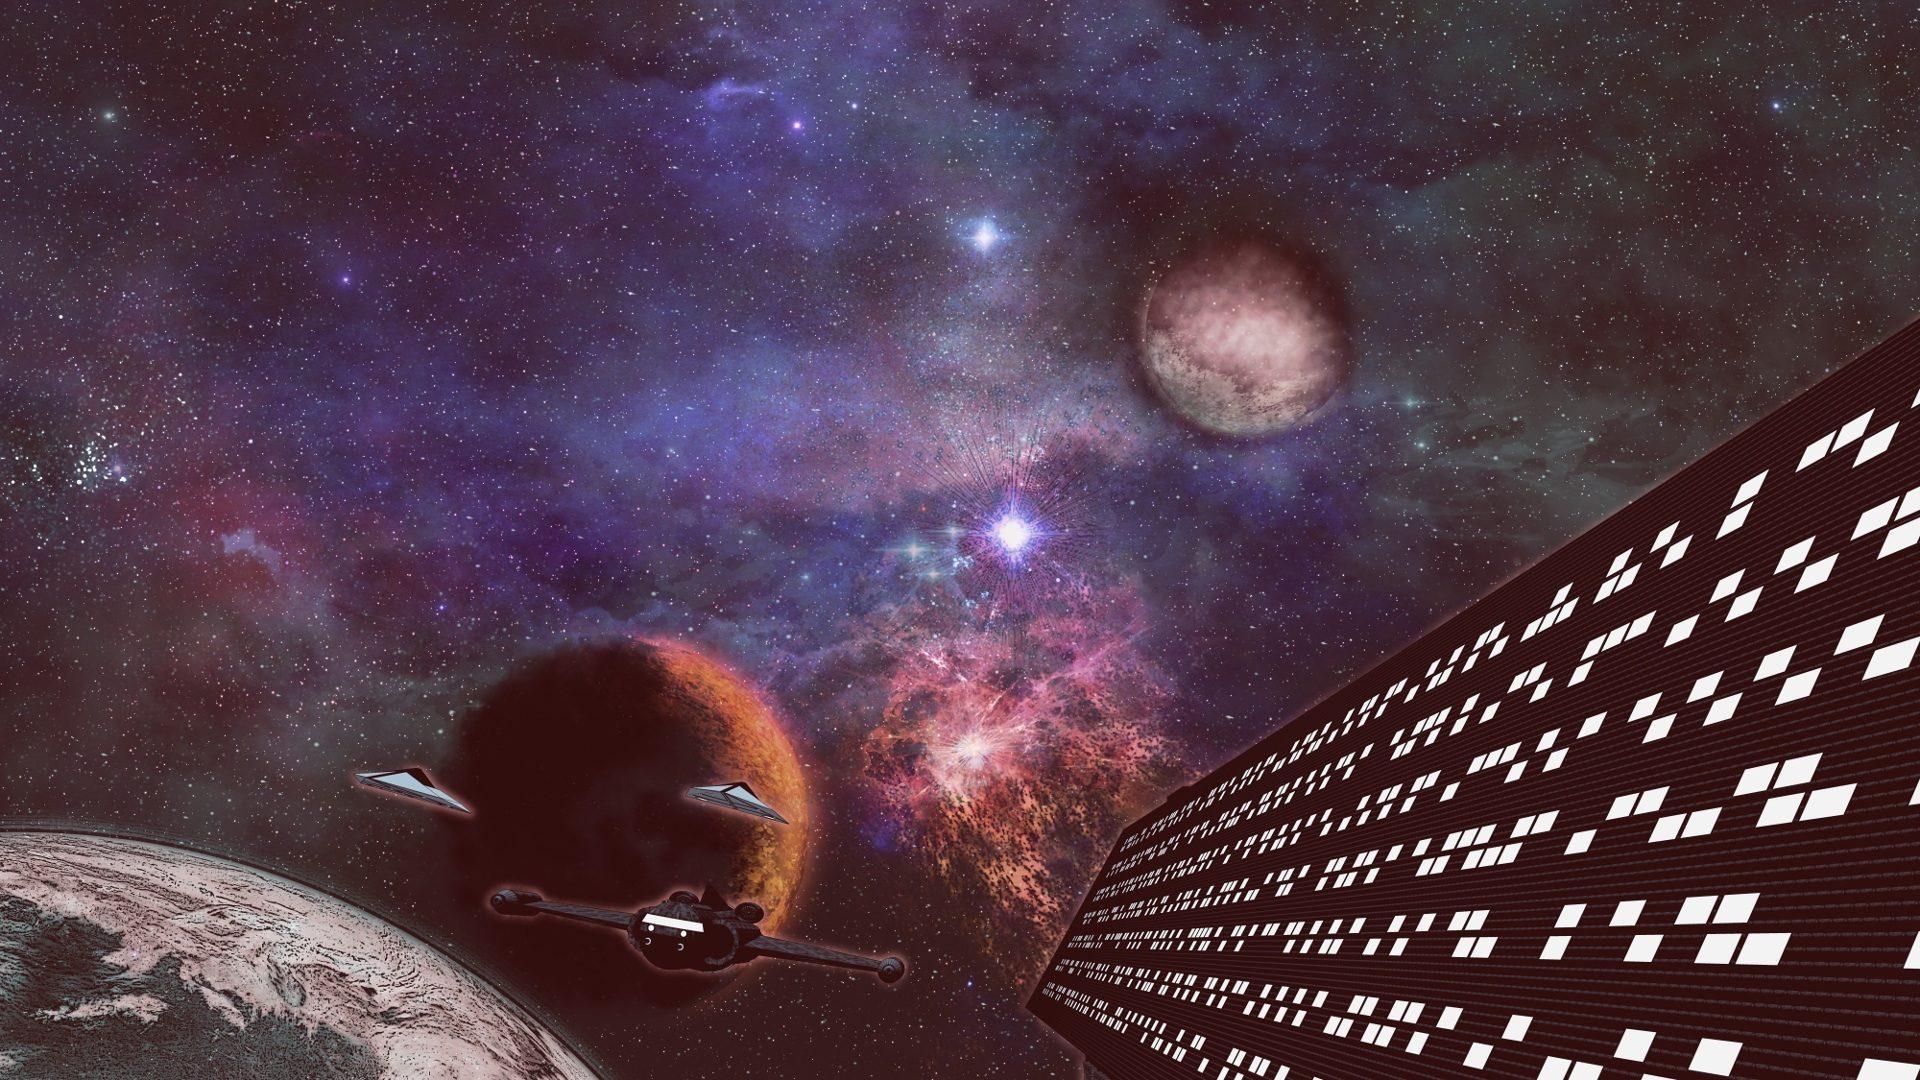 planetas, Estrela, naves, Alien, Alienígenas, universo - Papéis de parede HD - Professor-falken.com